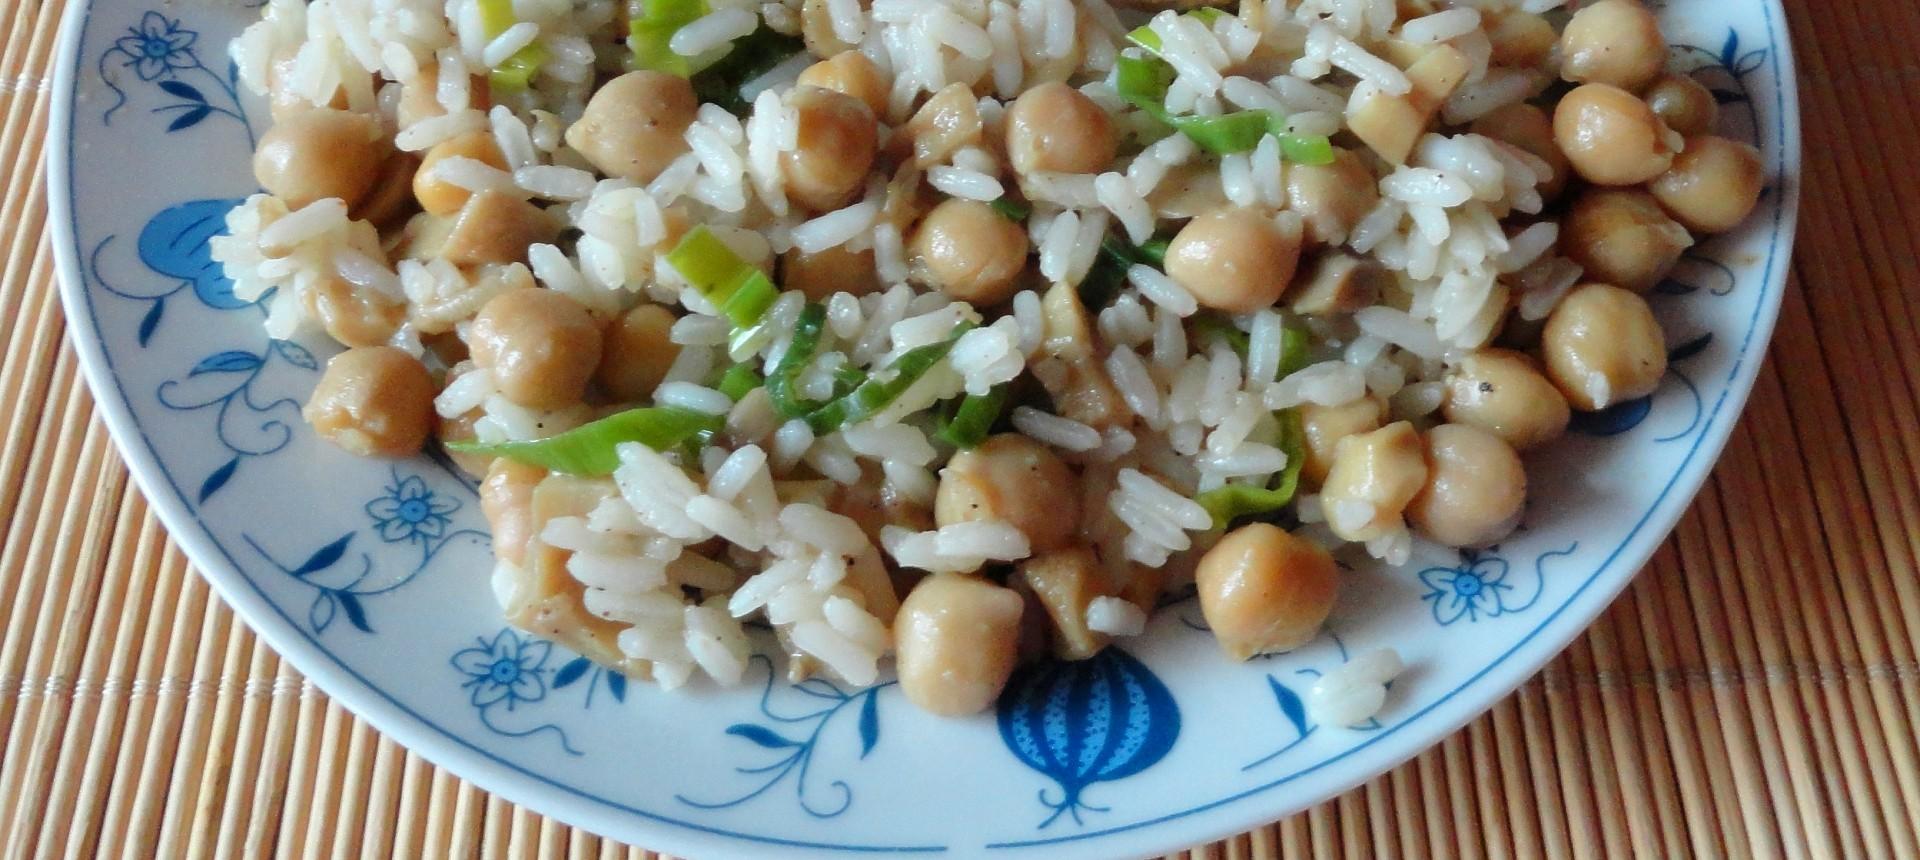 Cizrna s rýží, žampióny a pórkem